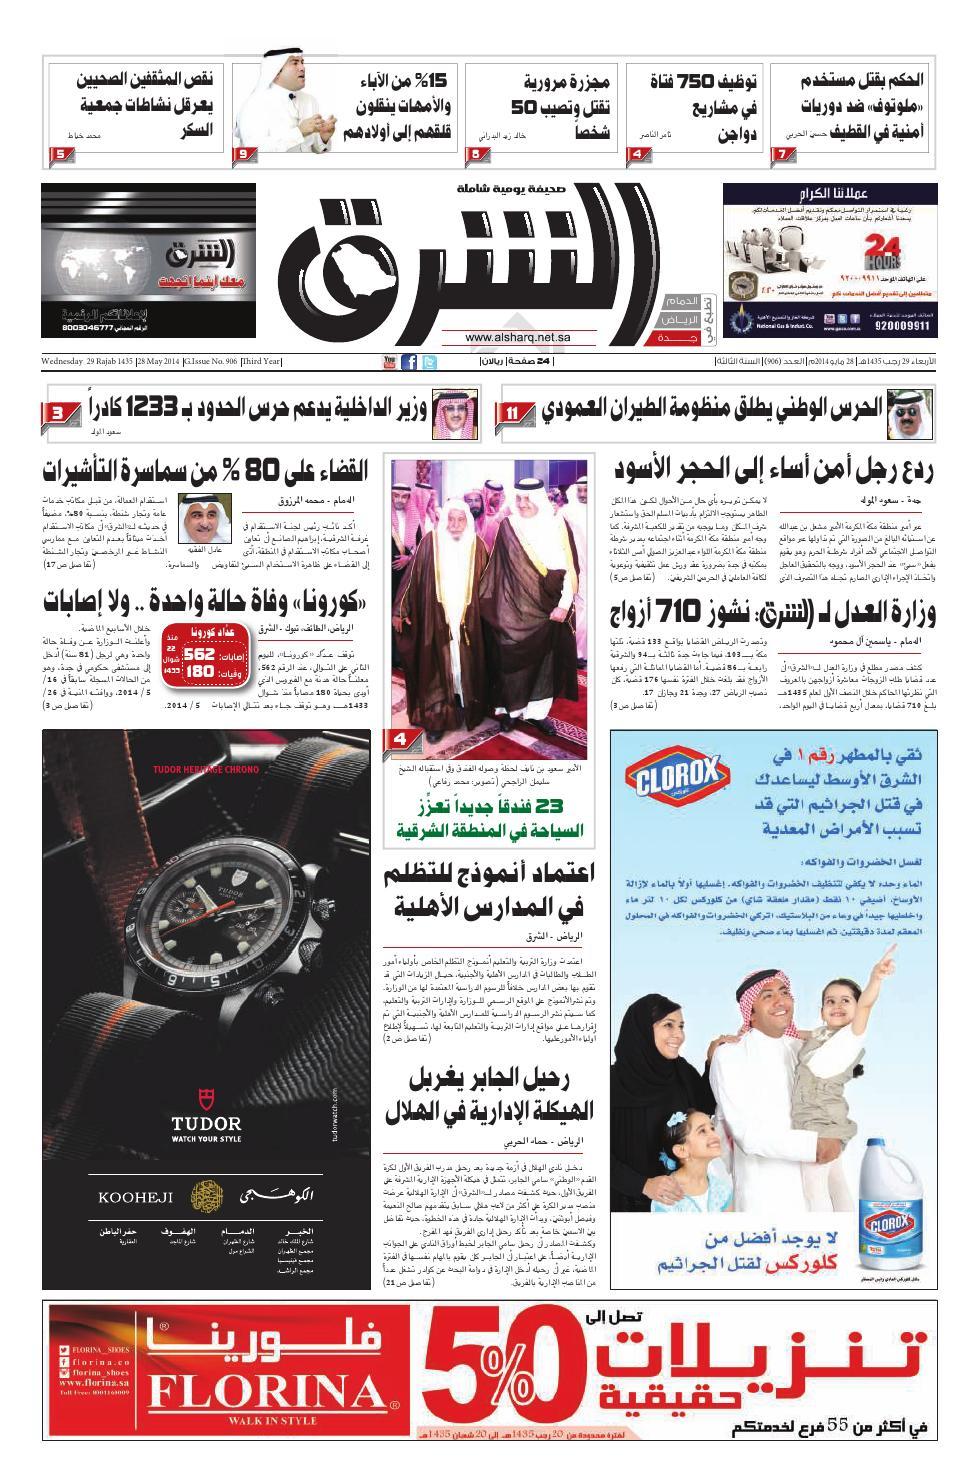 8d015c036 صحيفة الشرق - العدد 906 - نسخة جدة by صحيفة الشرق السعودية - issuu